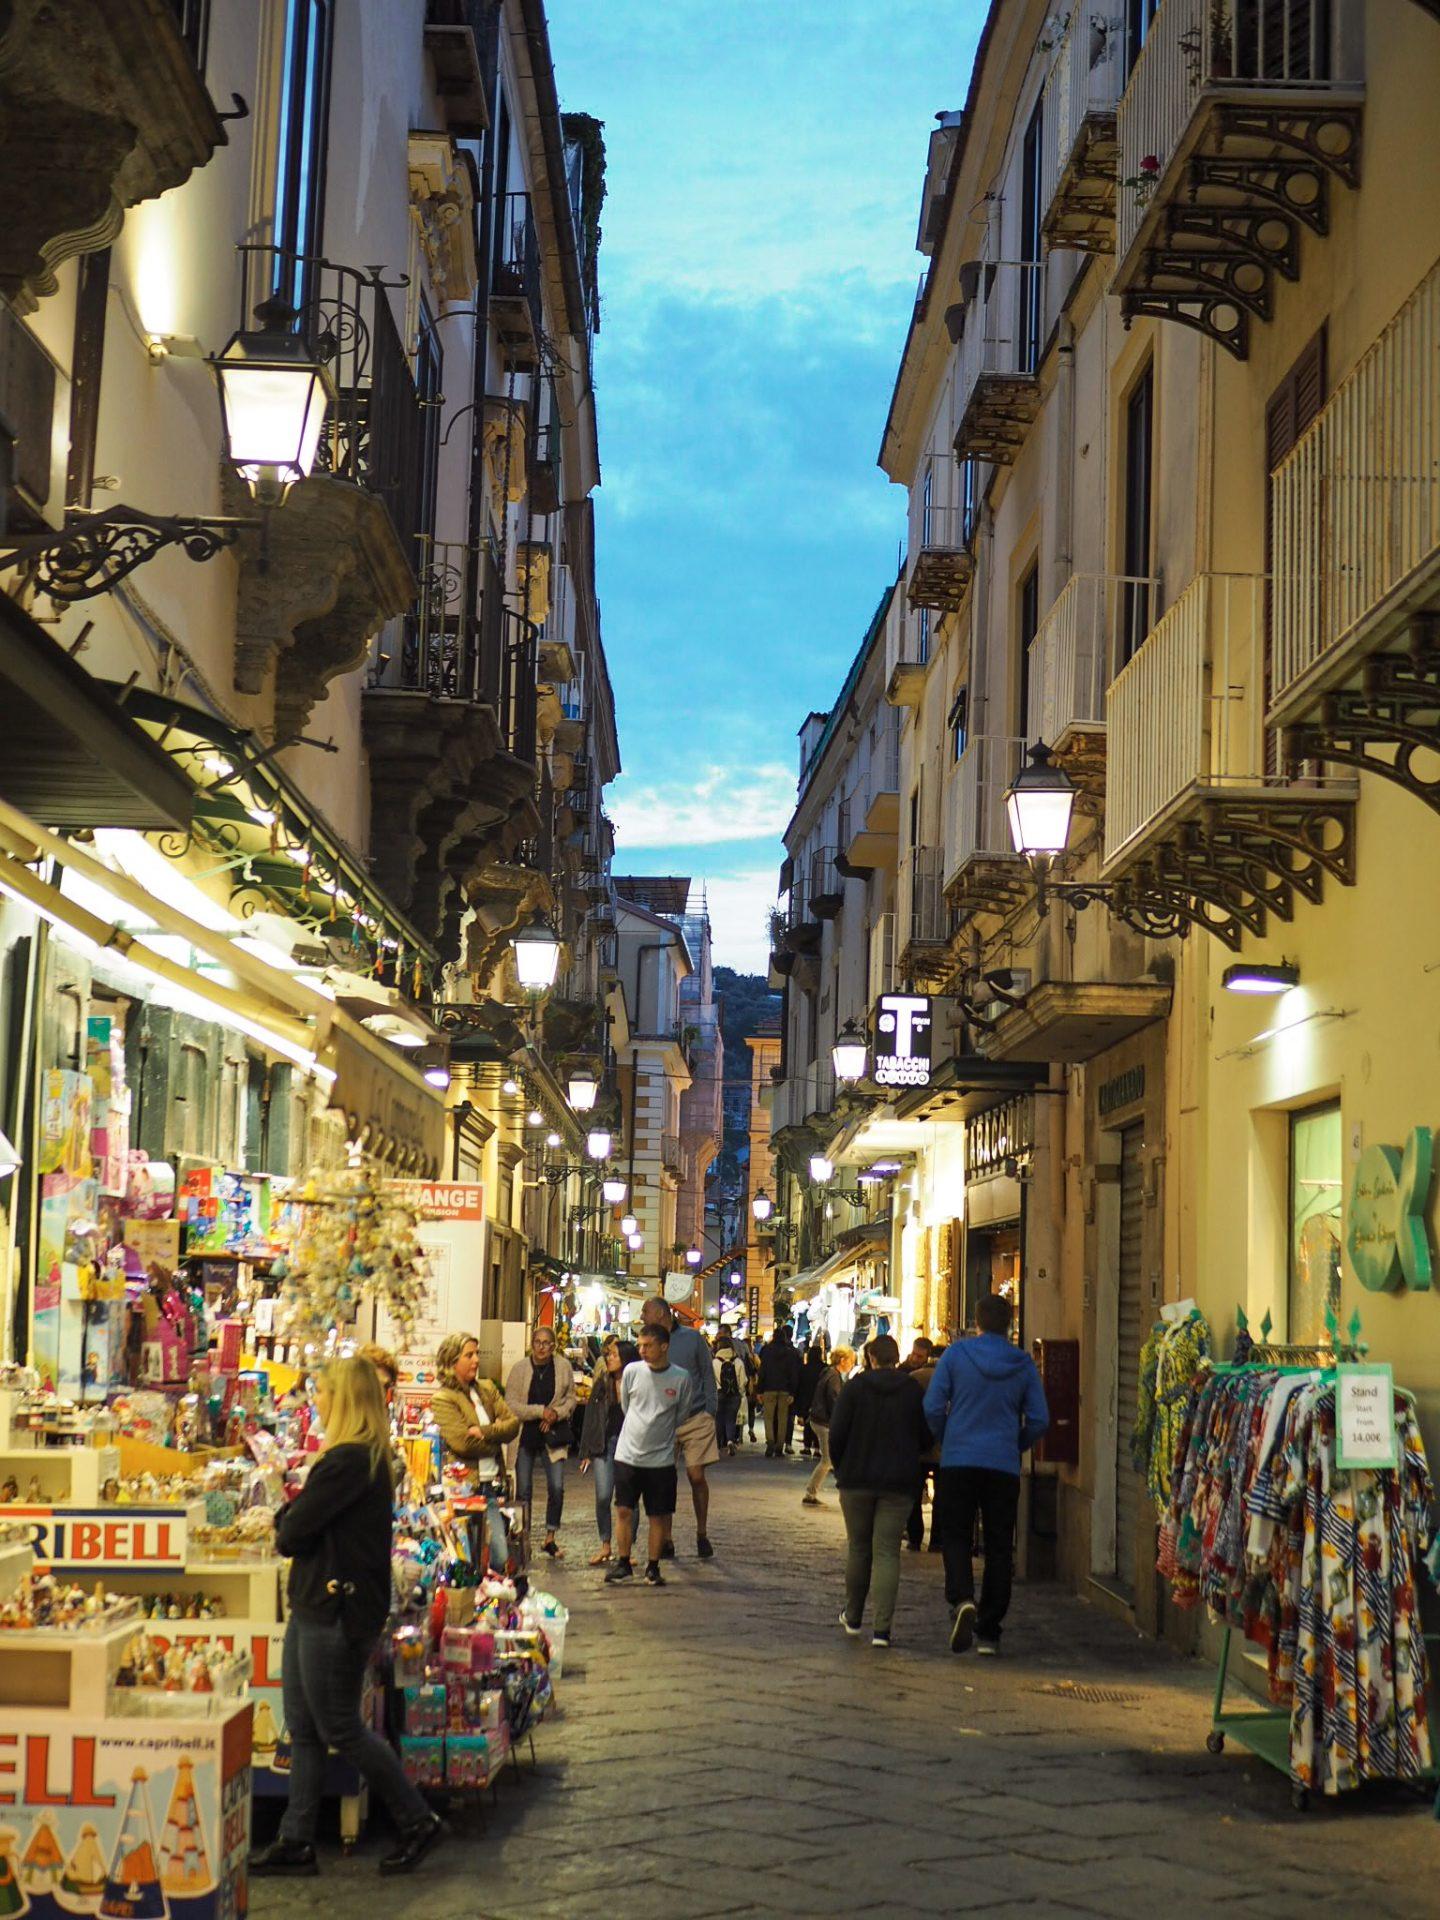 Sorrento travel backstreet at night